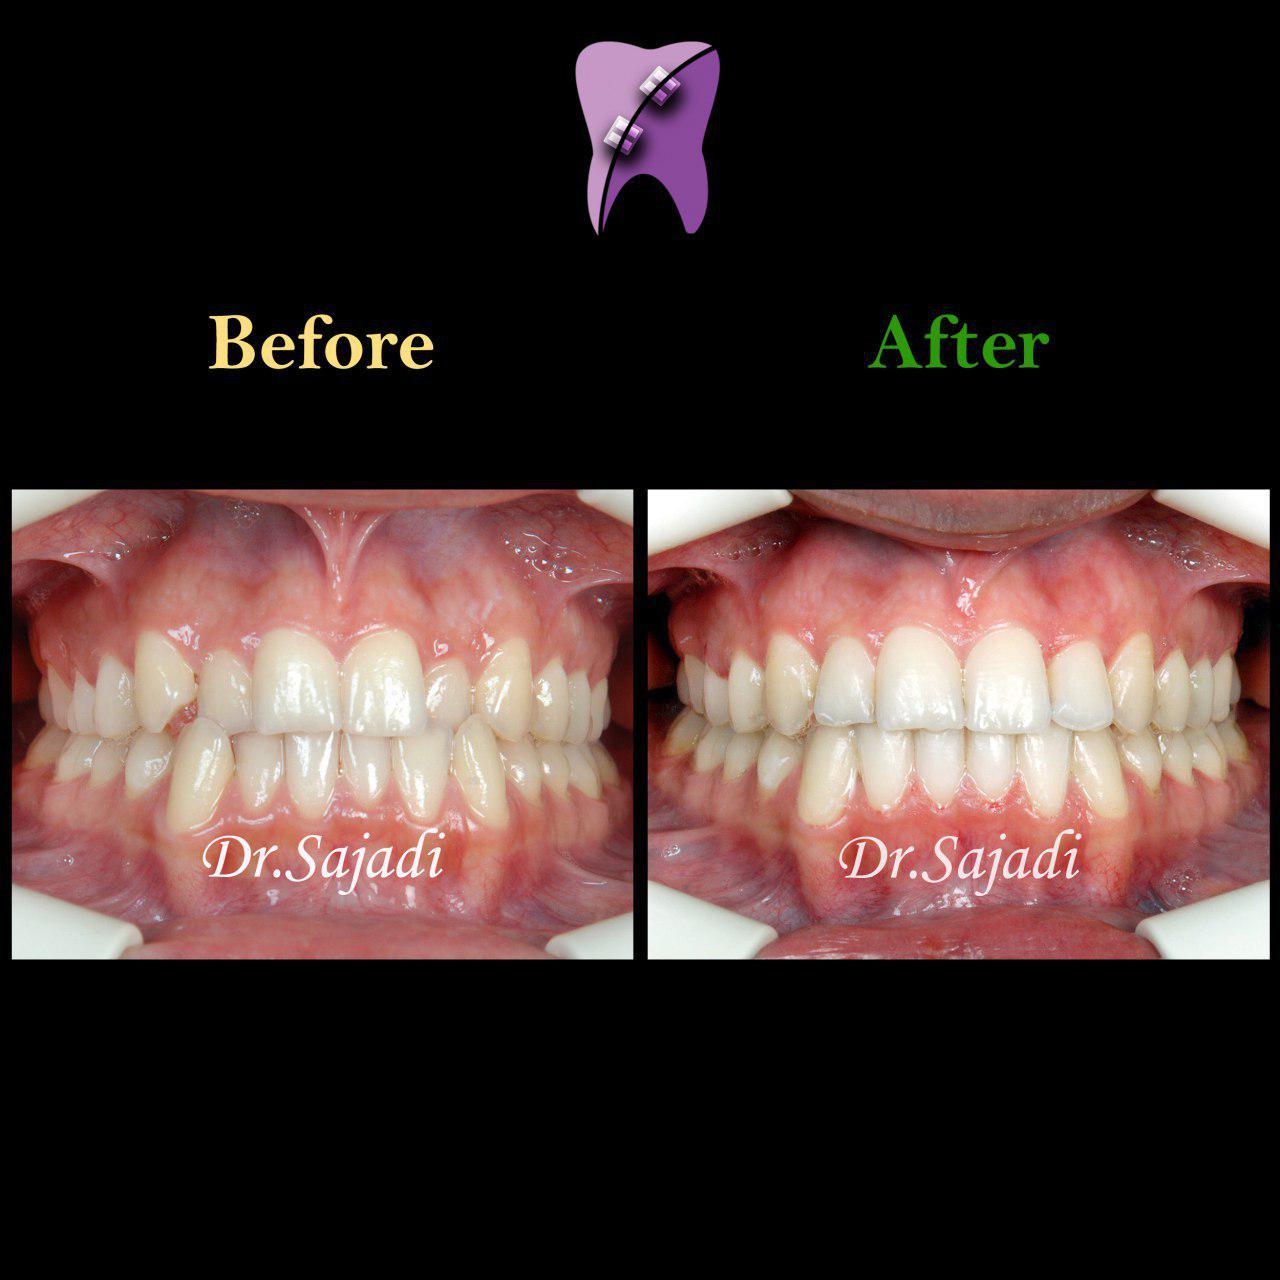 photo ۲۰۱۹ ۱۱ ۳۰ ۰۶ ۲۹ ۲۶ - درمان ارتودنسي ثابت دو فك بدون كشيدن دندان